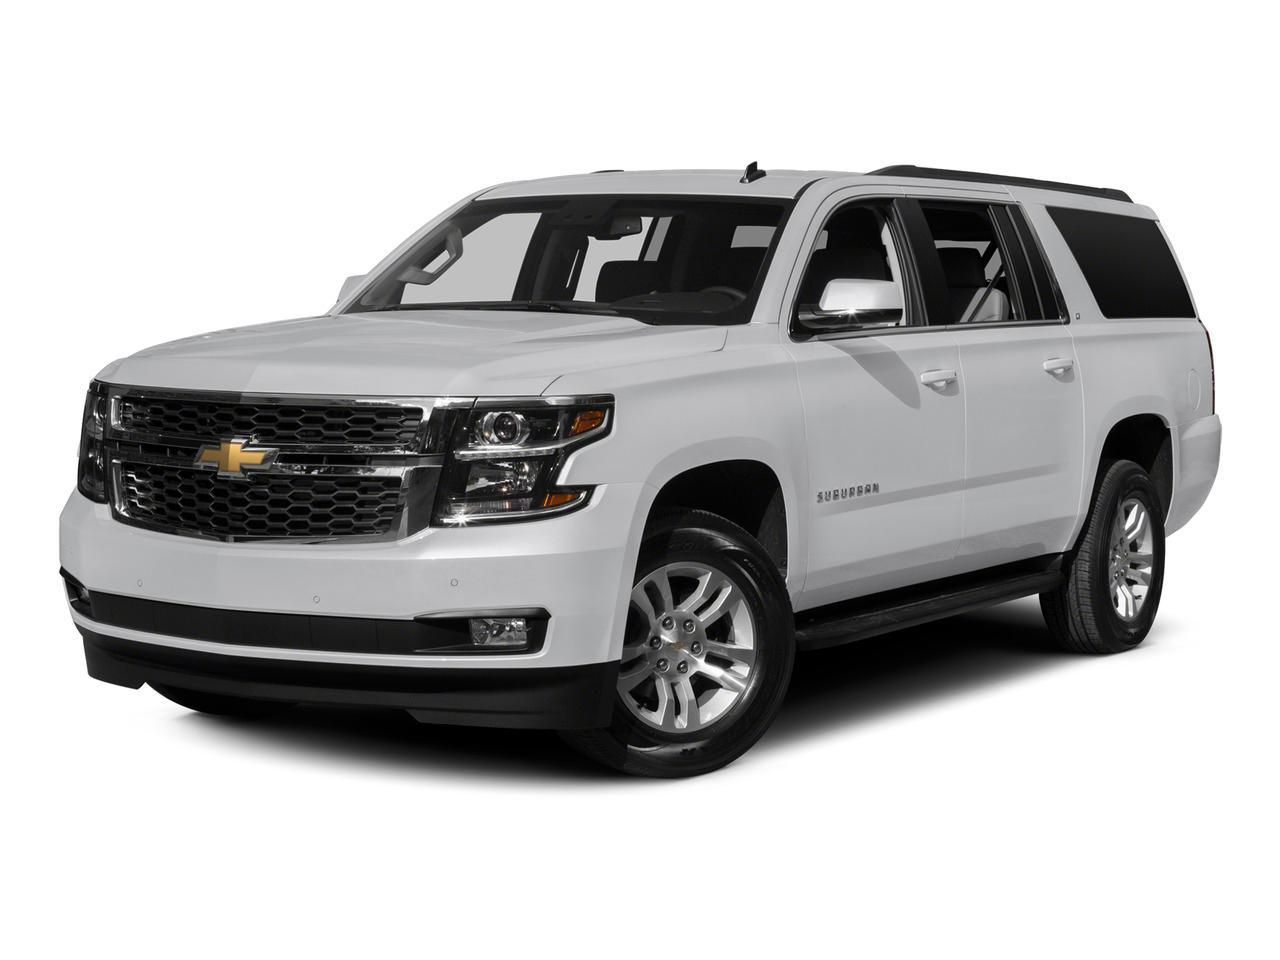 2015 Chevrolet Suburban Vehicle Photo in ODESSA, TX 79762-8186